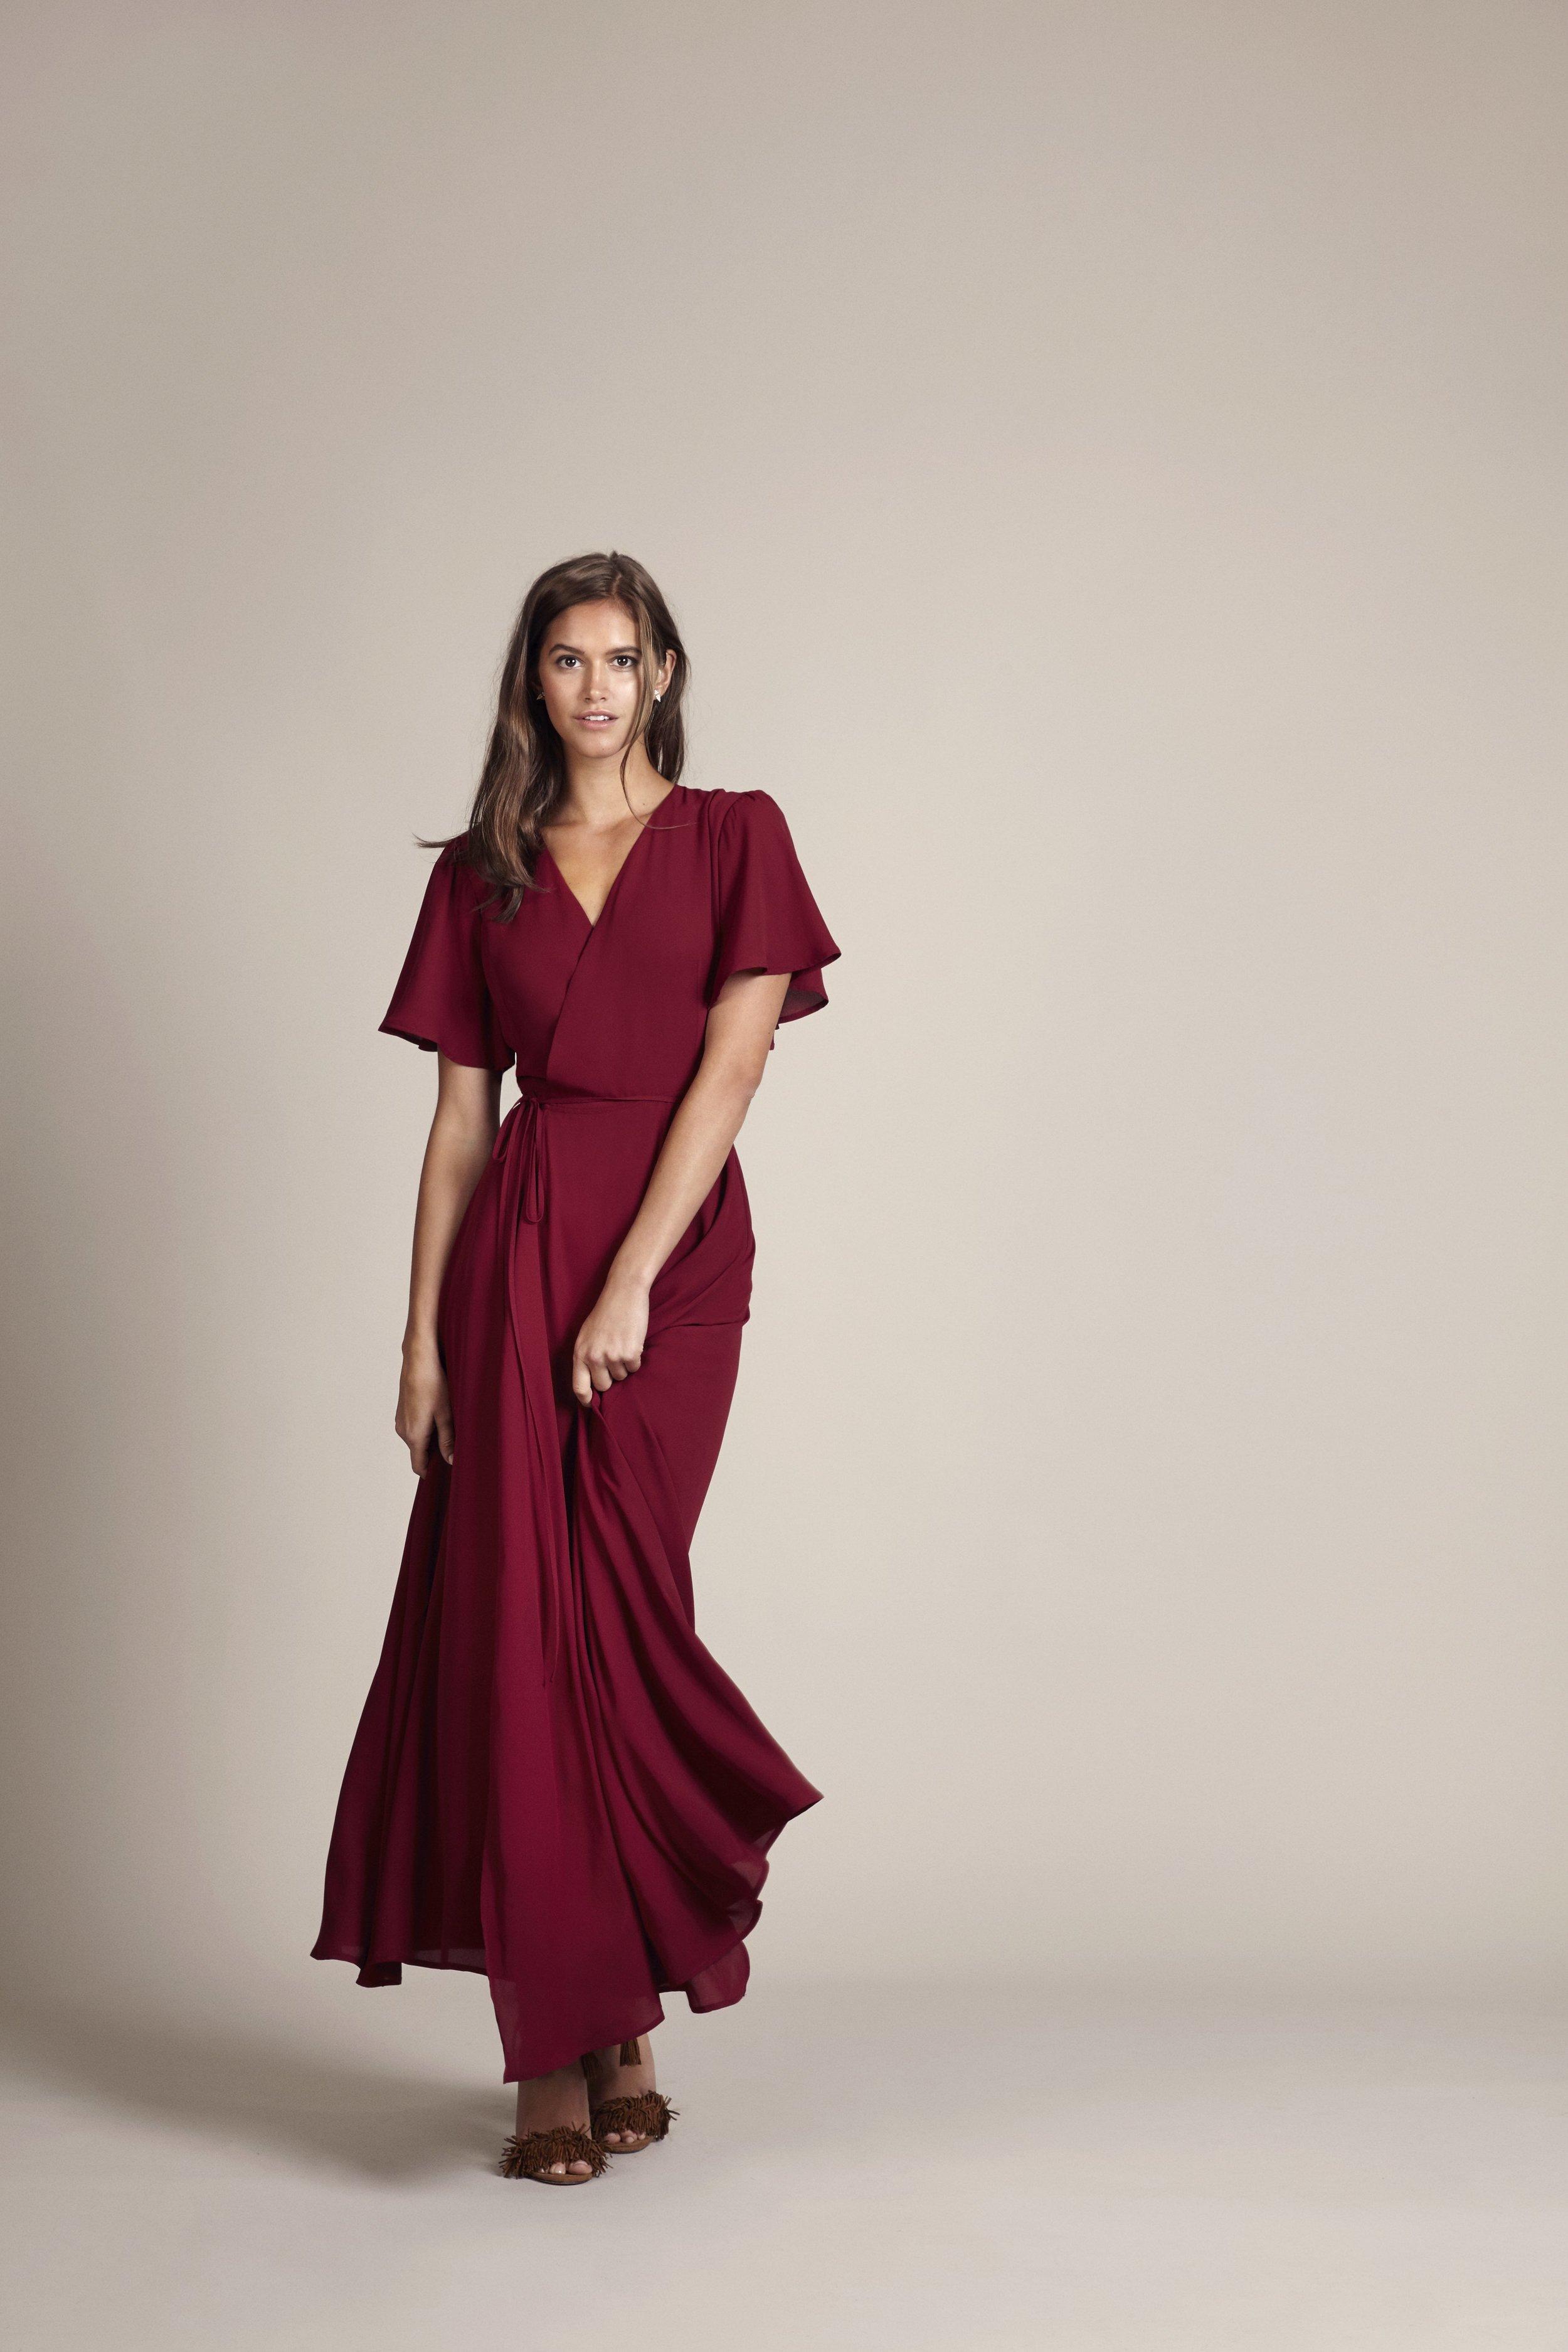 Florence-wrap dress-red-bridesmaid-1.jpg